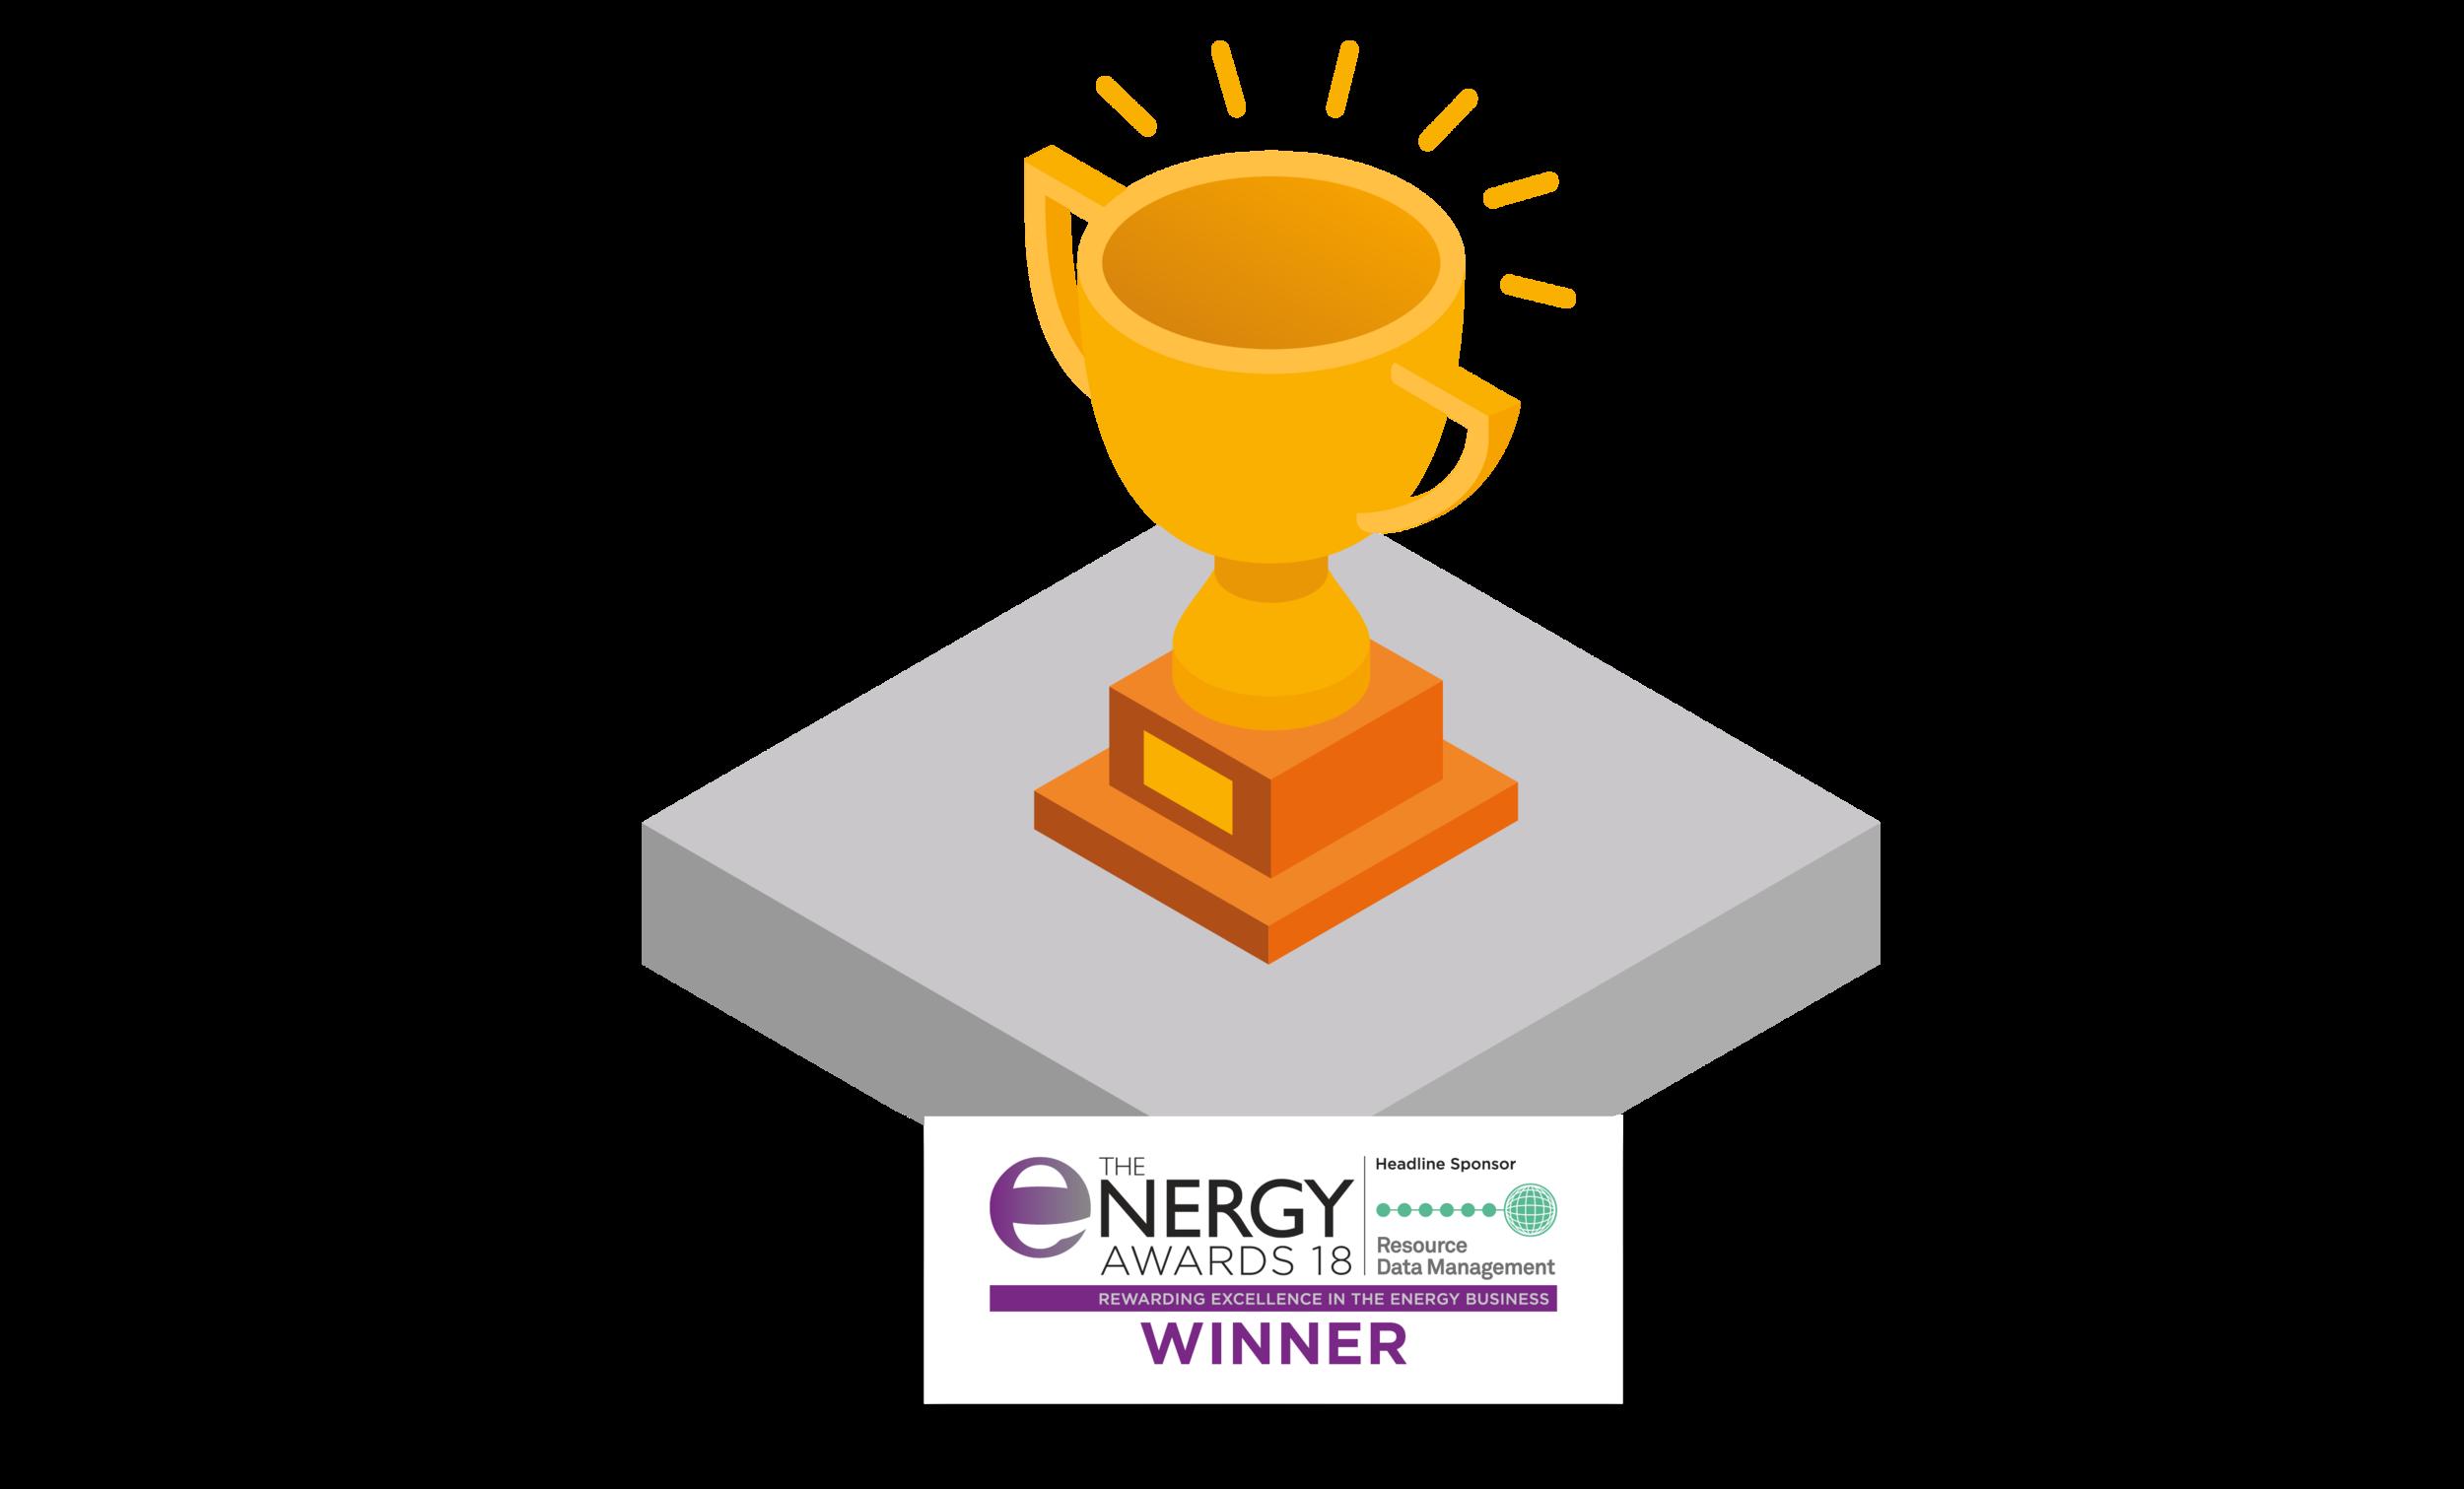 Energy Event Awards Participation Logo - Winner_Illustration 3.png